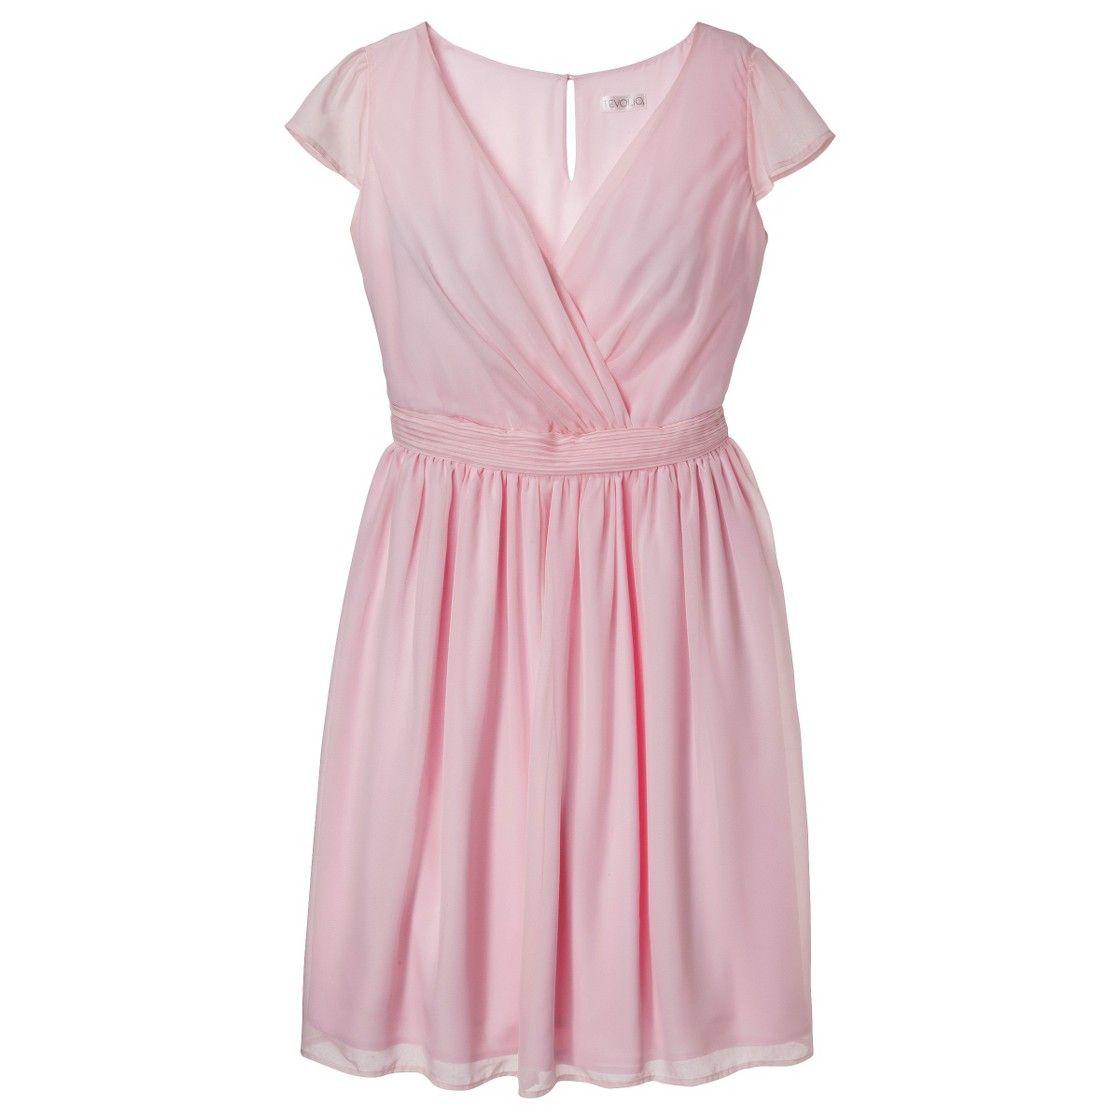 Womenus chiffon cap sleeve vneck bridesmaid dress fashion colors